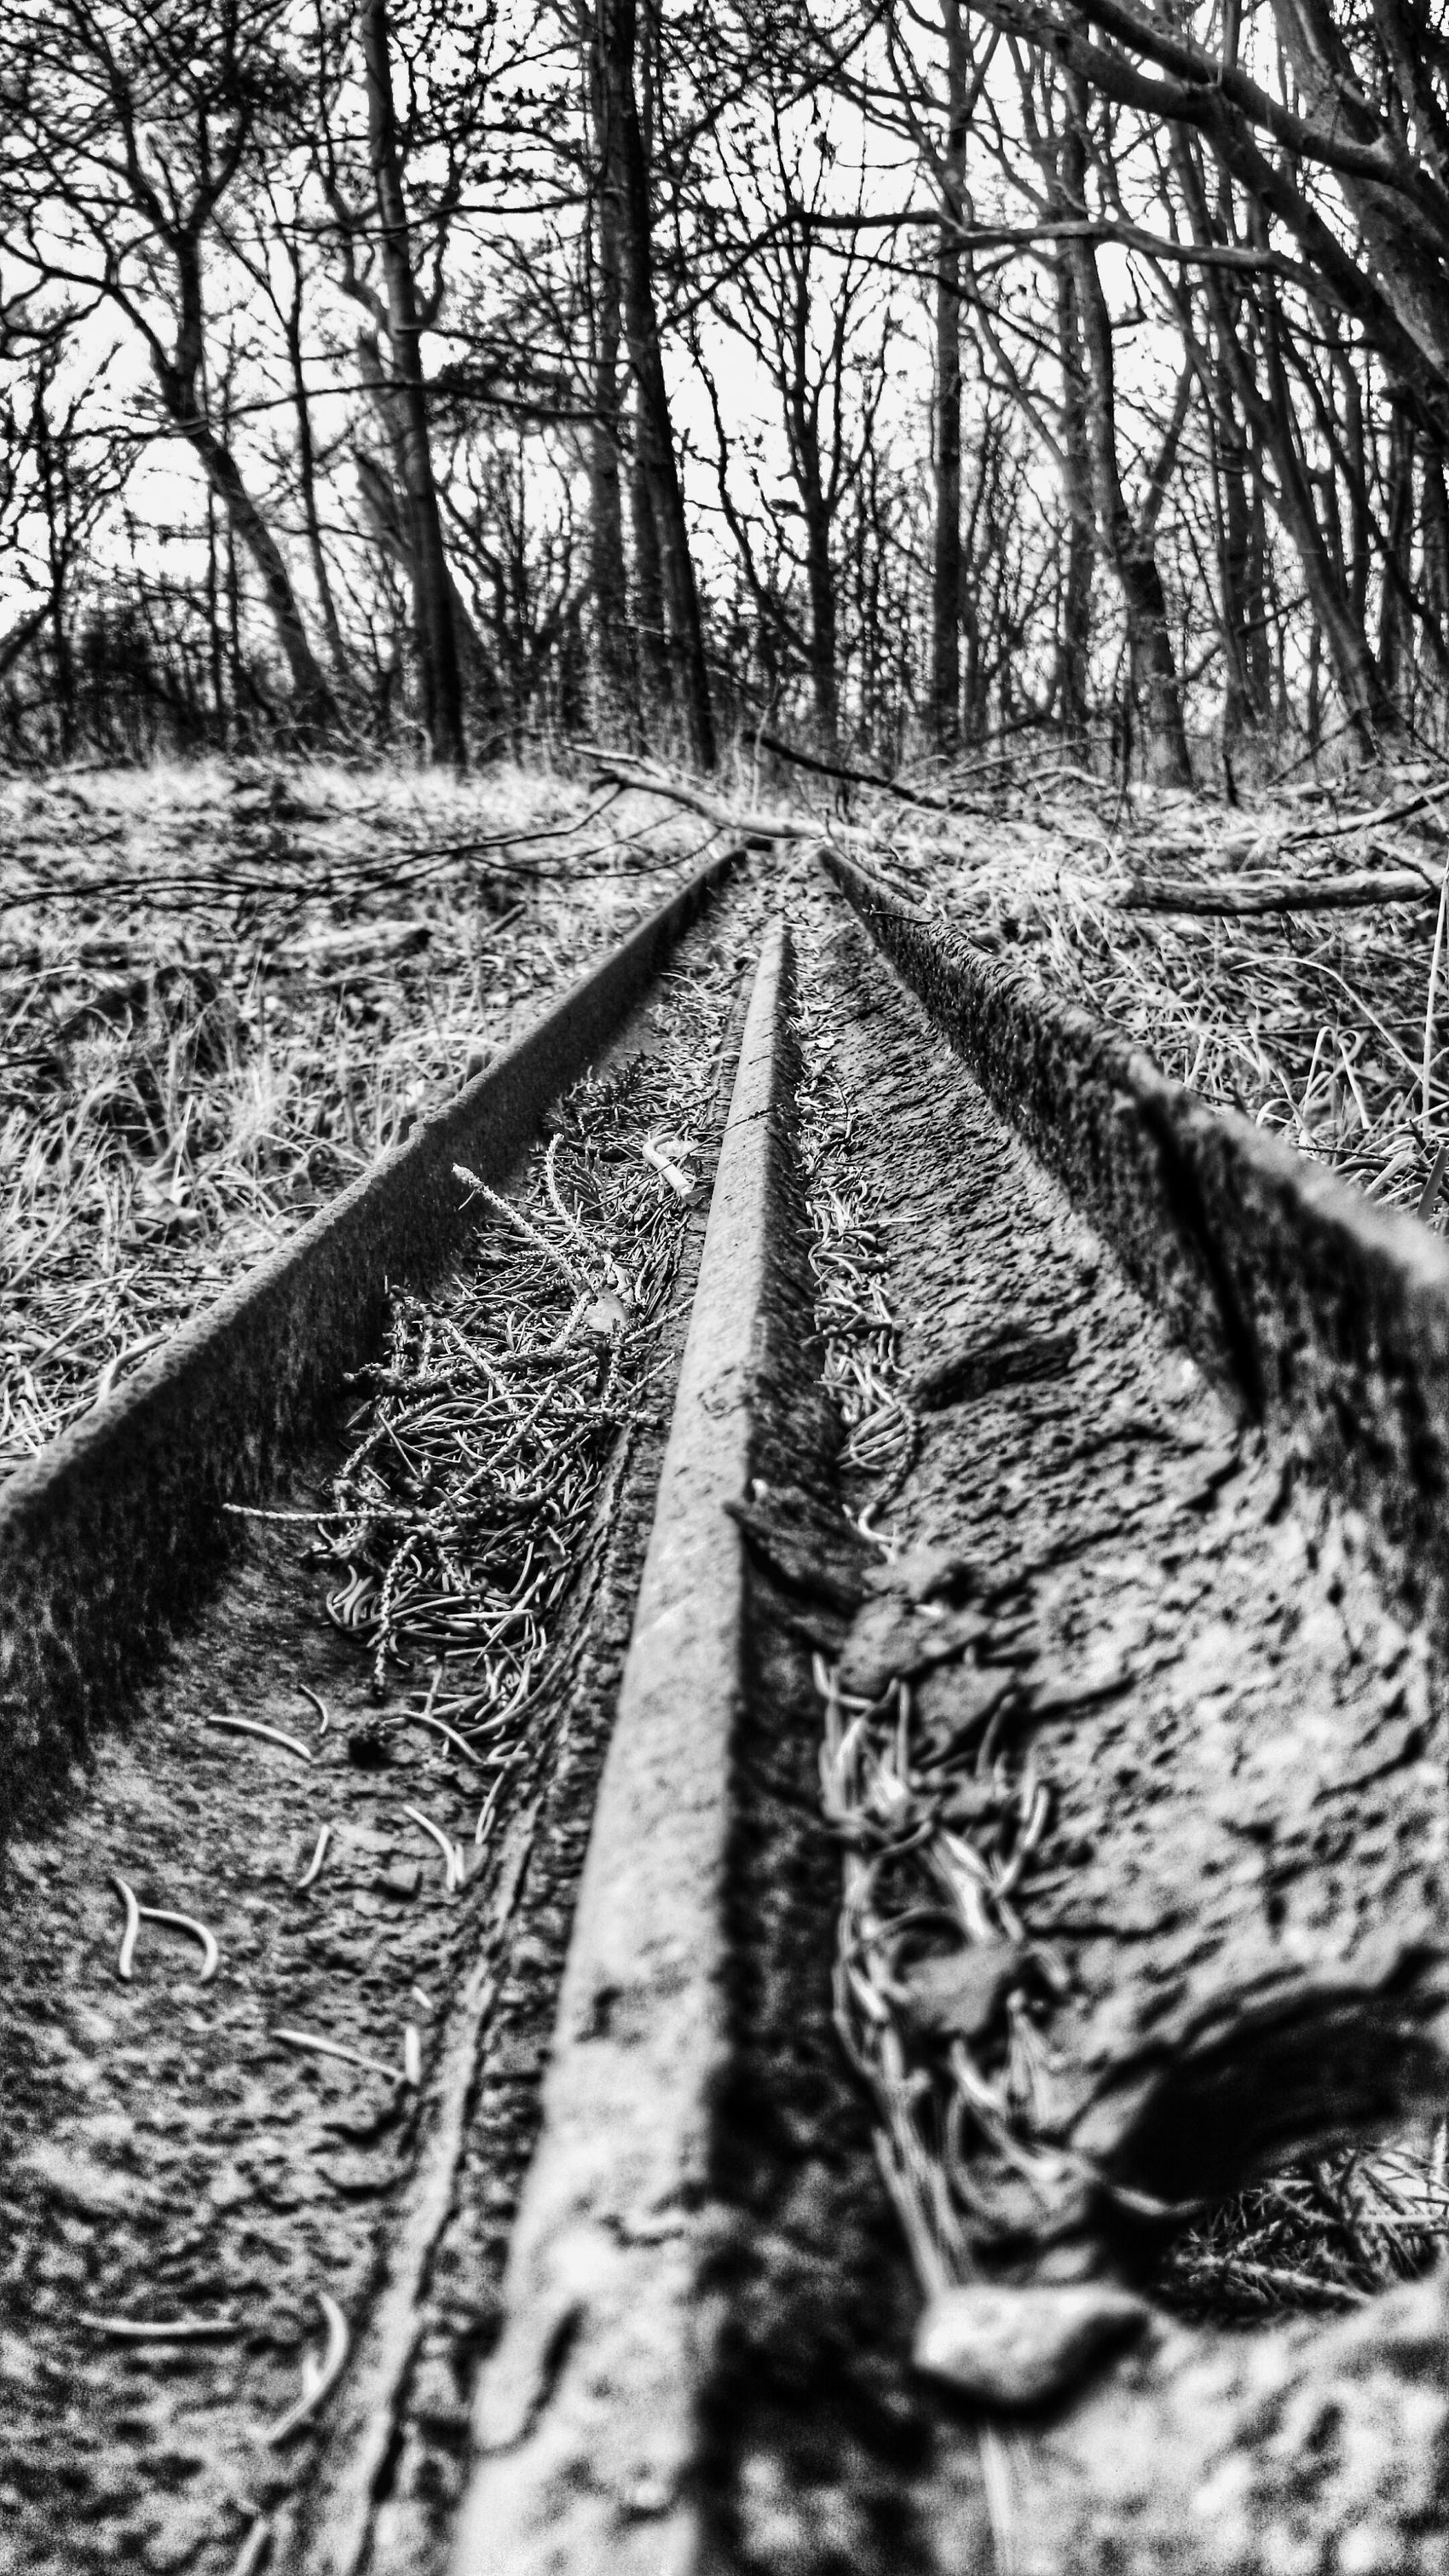 Iron Railroad Tracks Järn Järnvägsspår